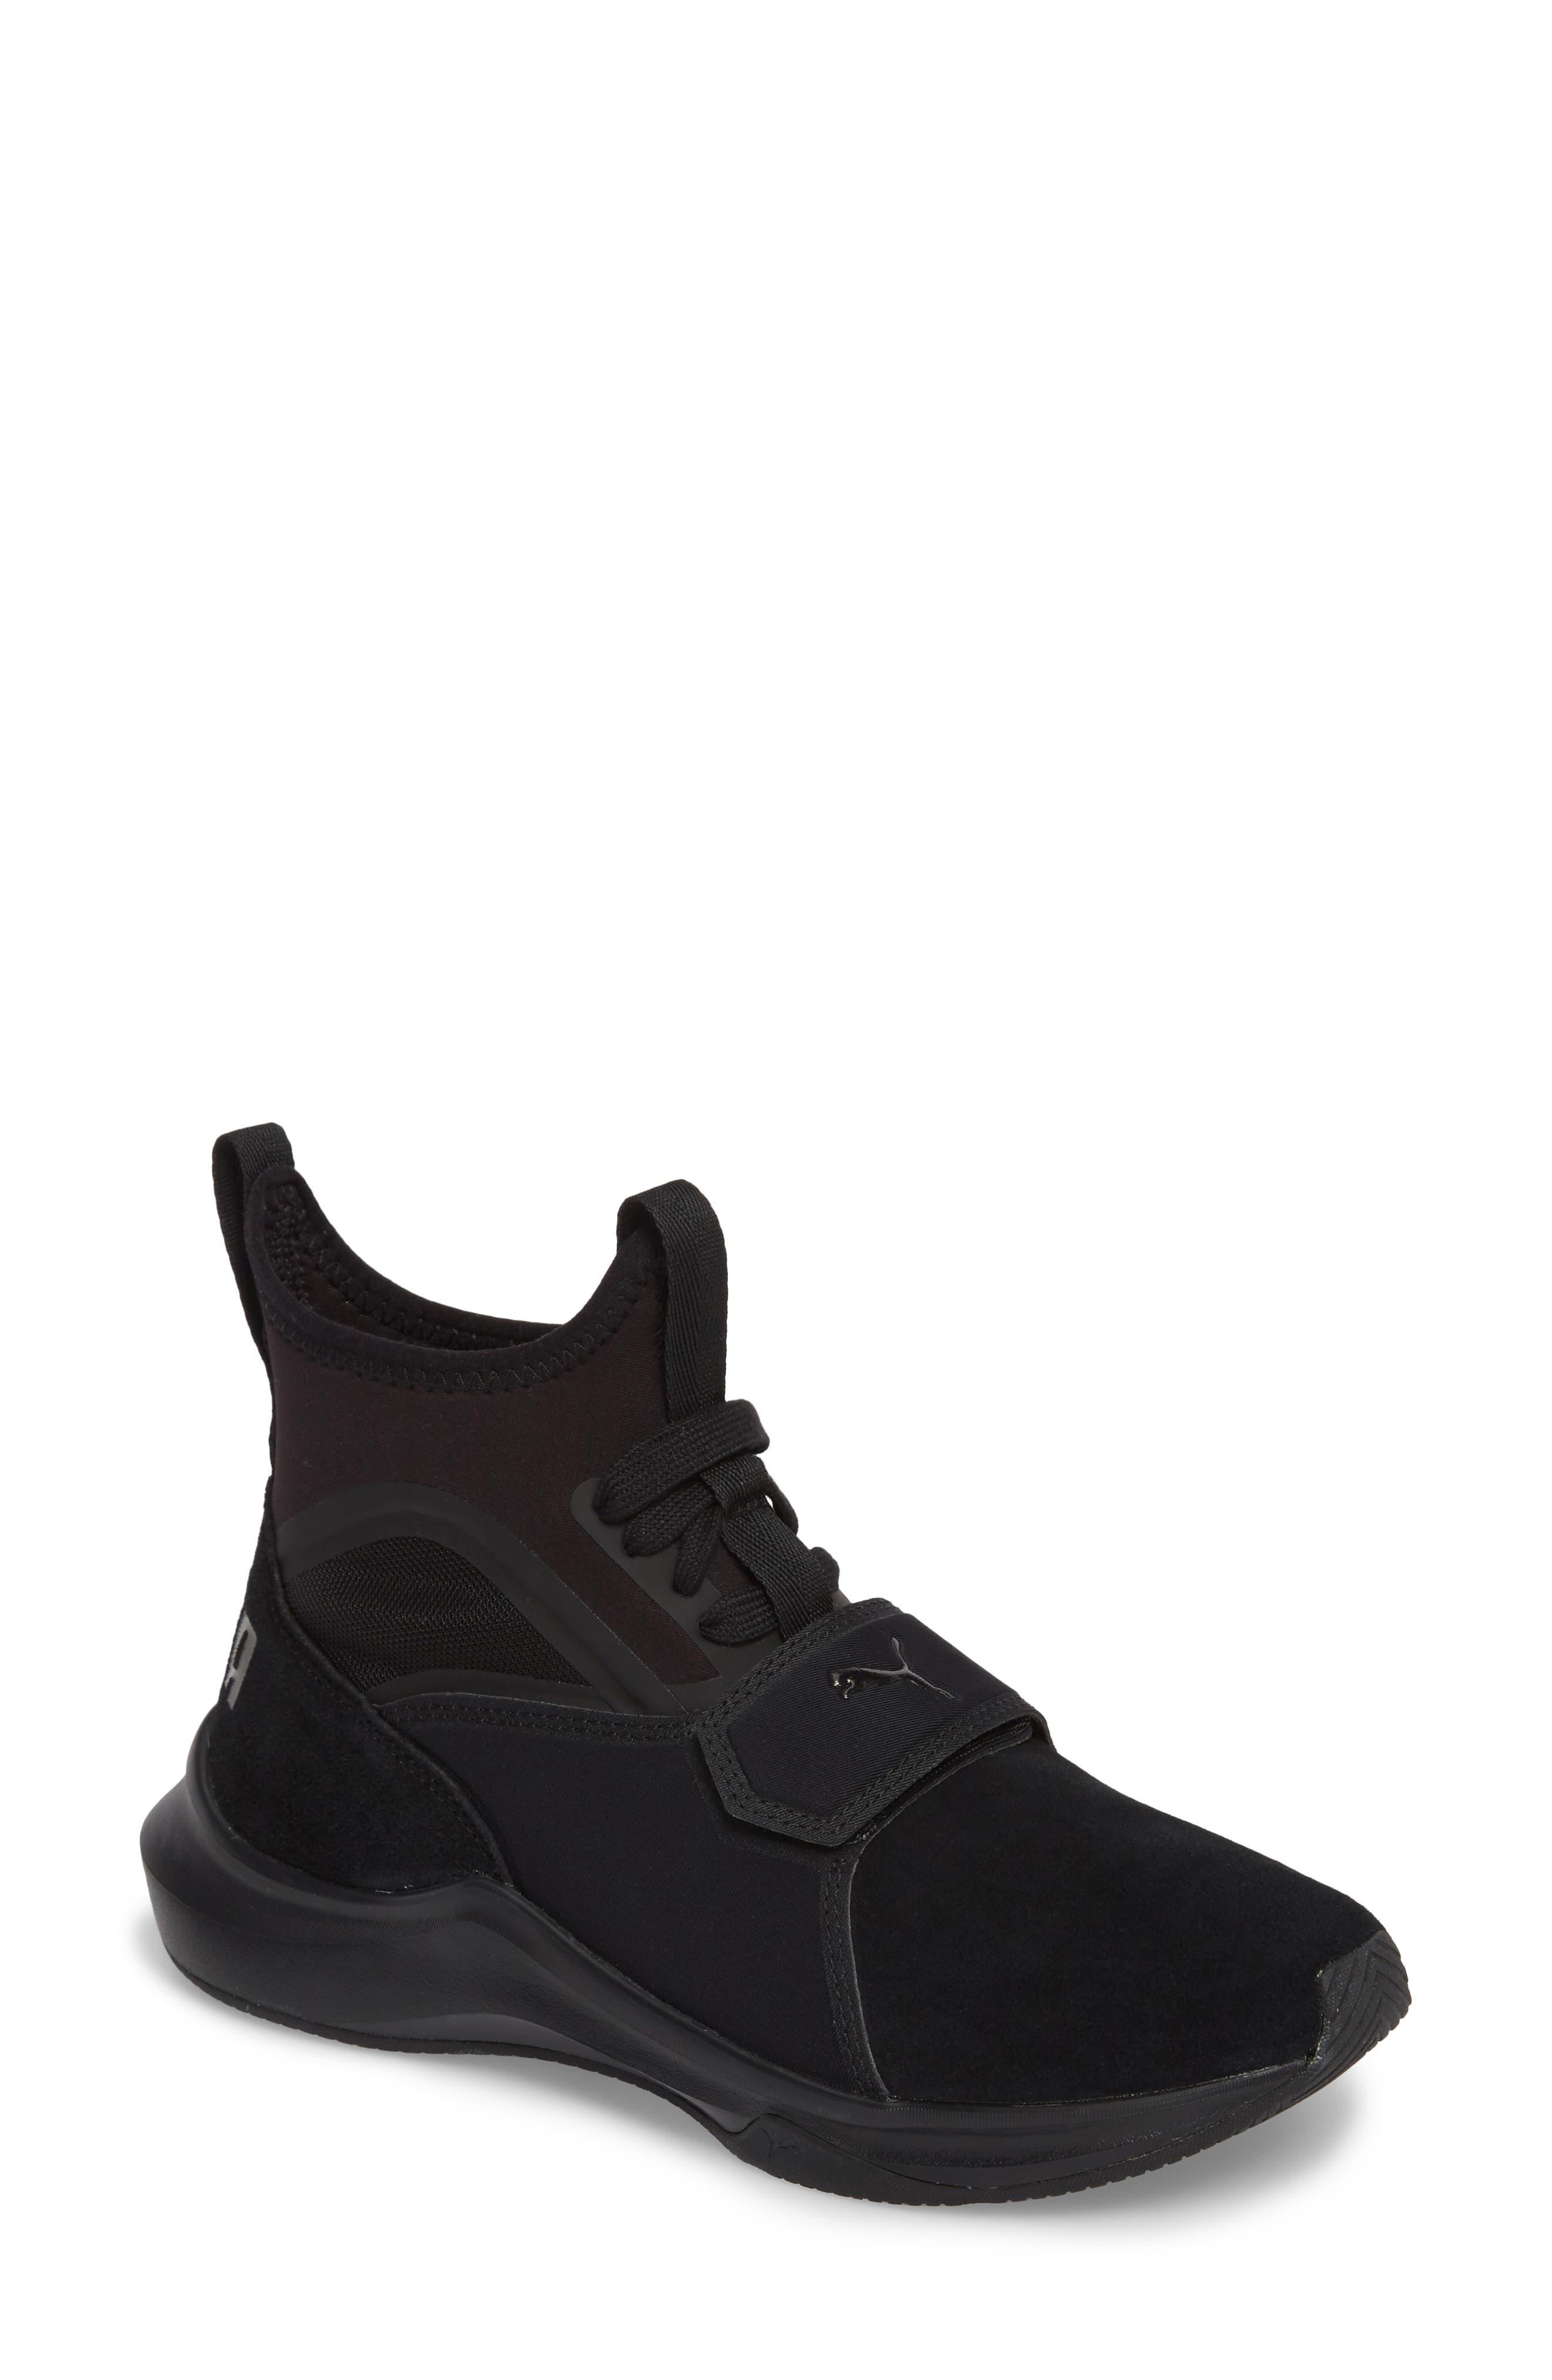 Image of PUMA Phenom High Top Training Sneaker